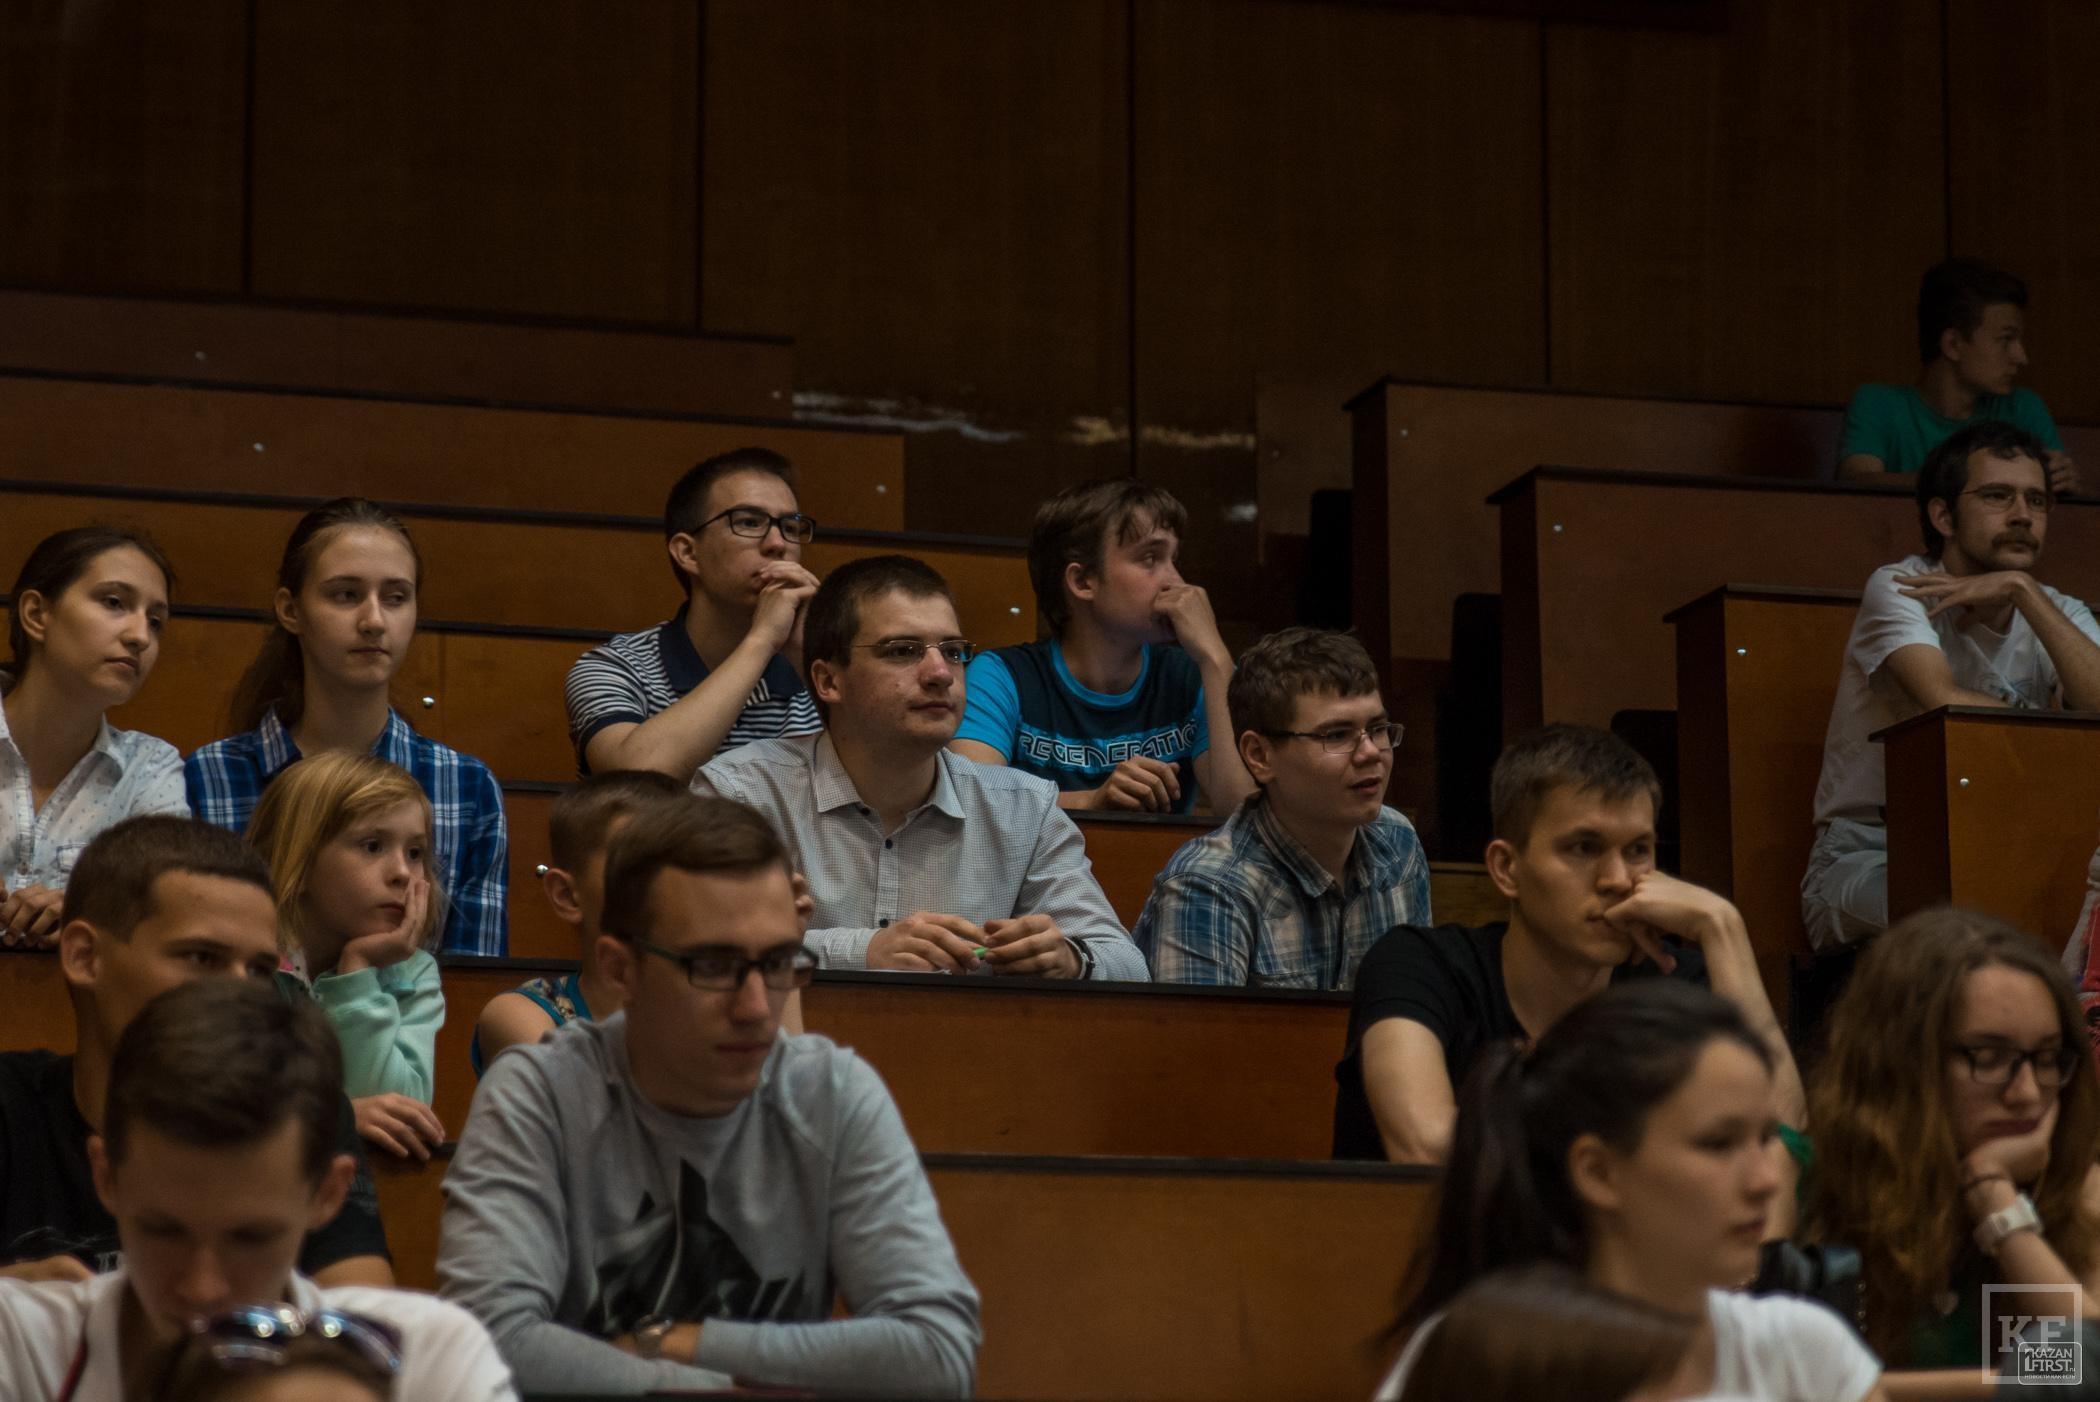 В Институте физики КФУ прошел вечер науки